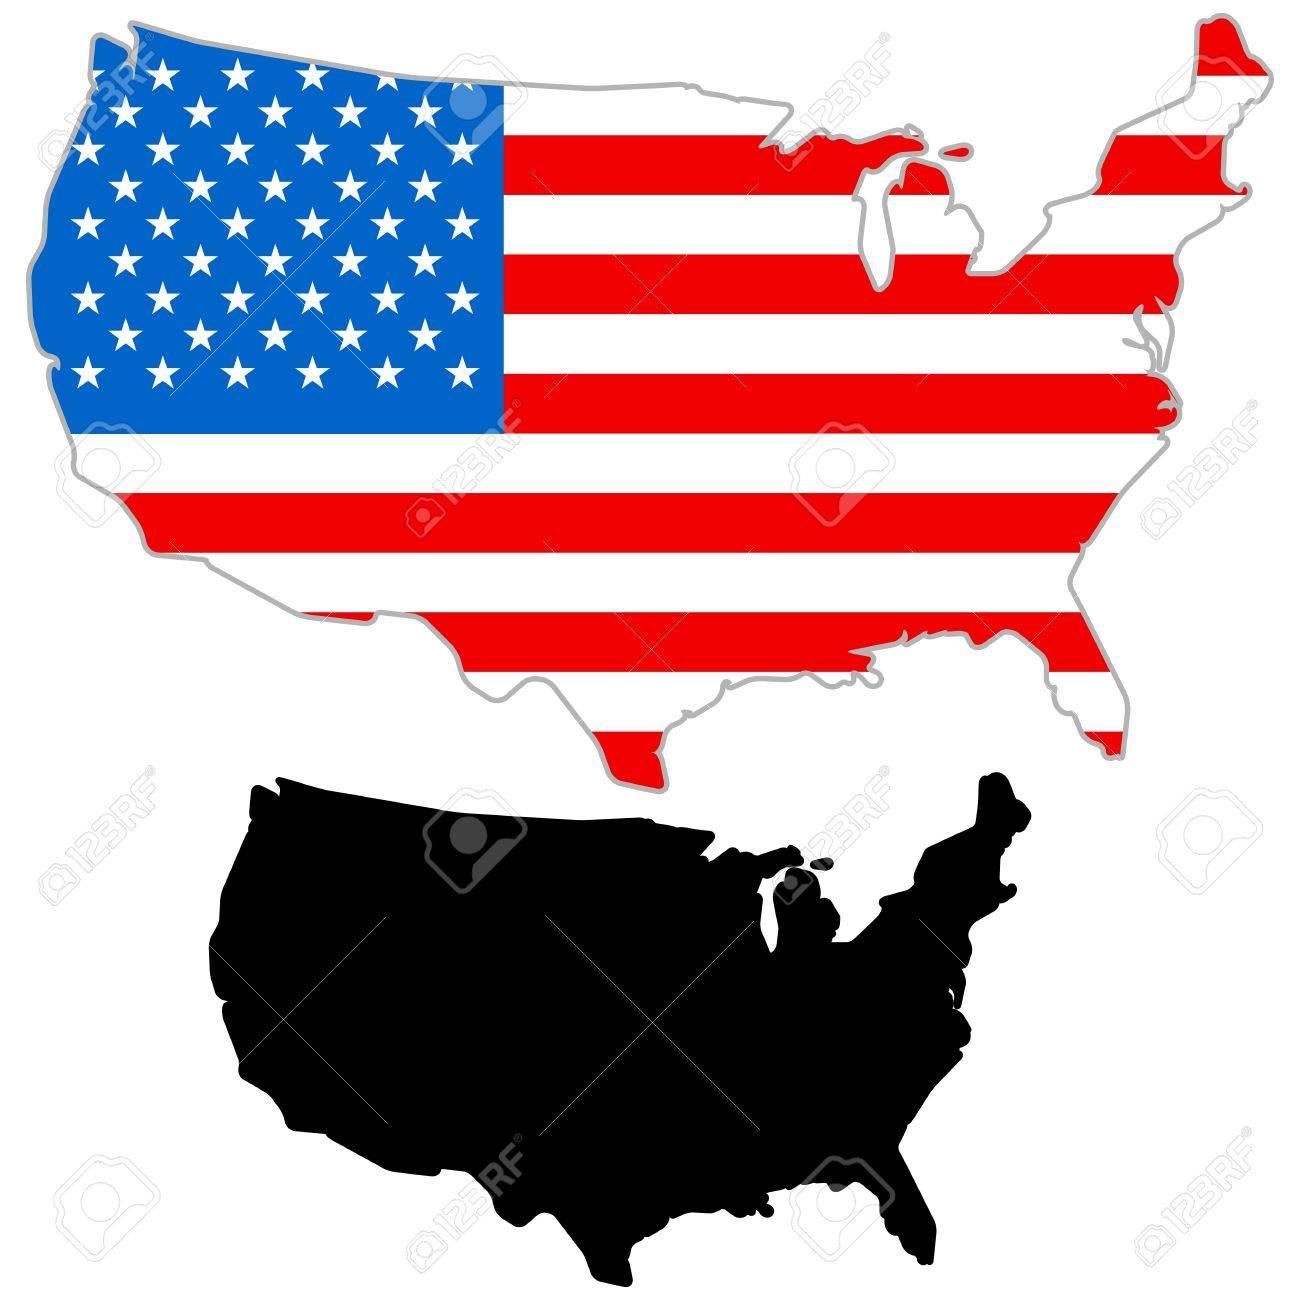 USA Map Flag On A White Background Vector Illustrator Royalty - Illustrator us map